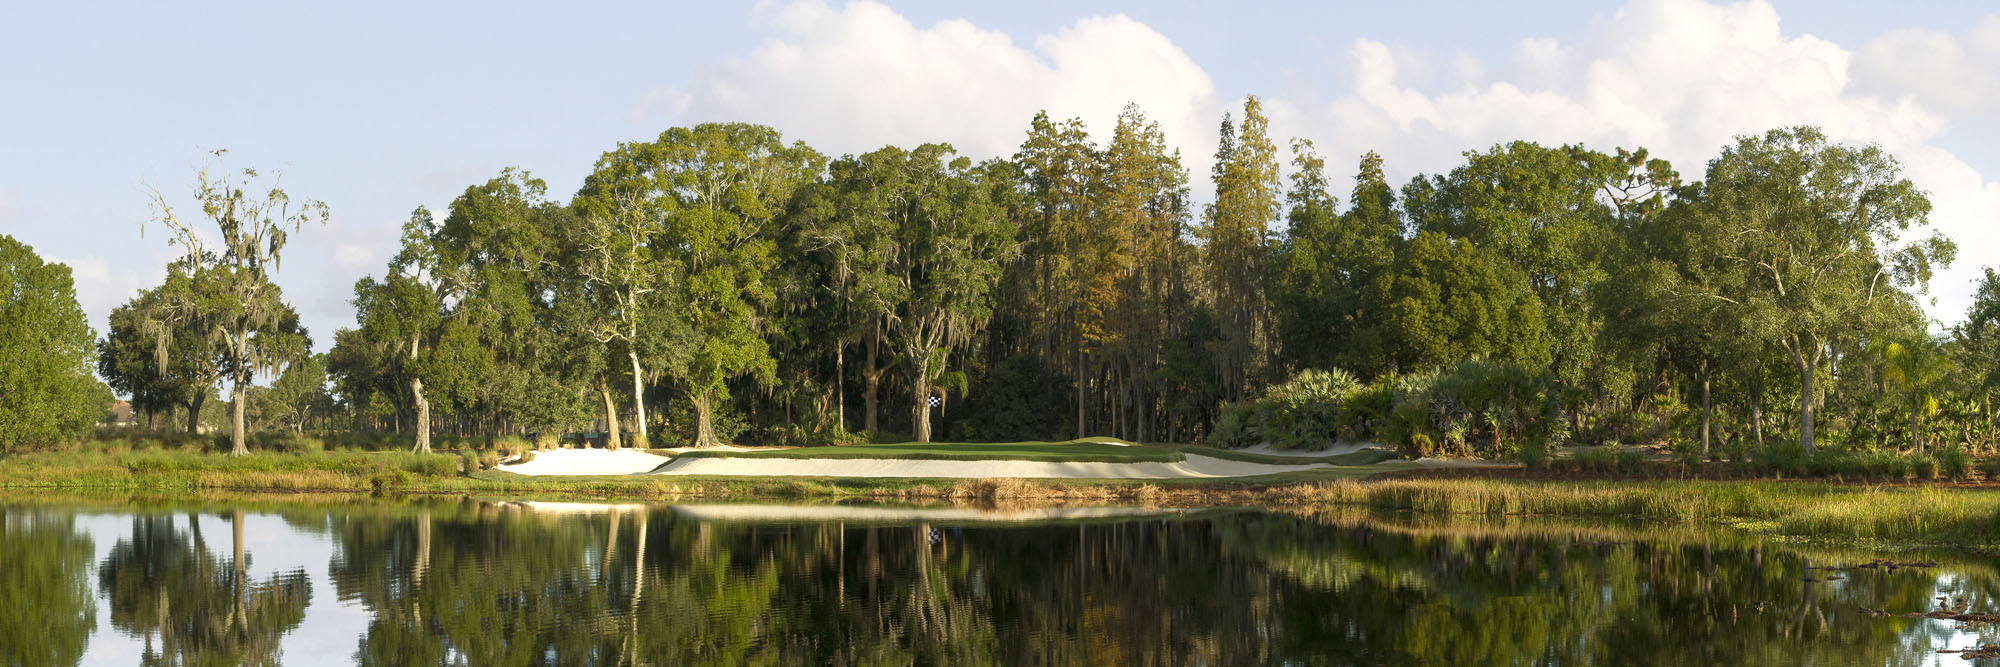 Golf Course Image - Old Memorial Golf Club No. 7